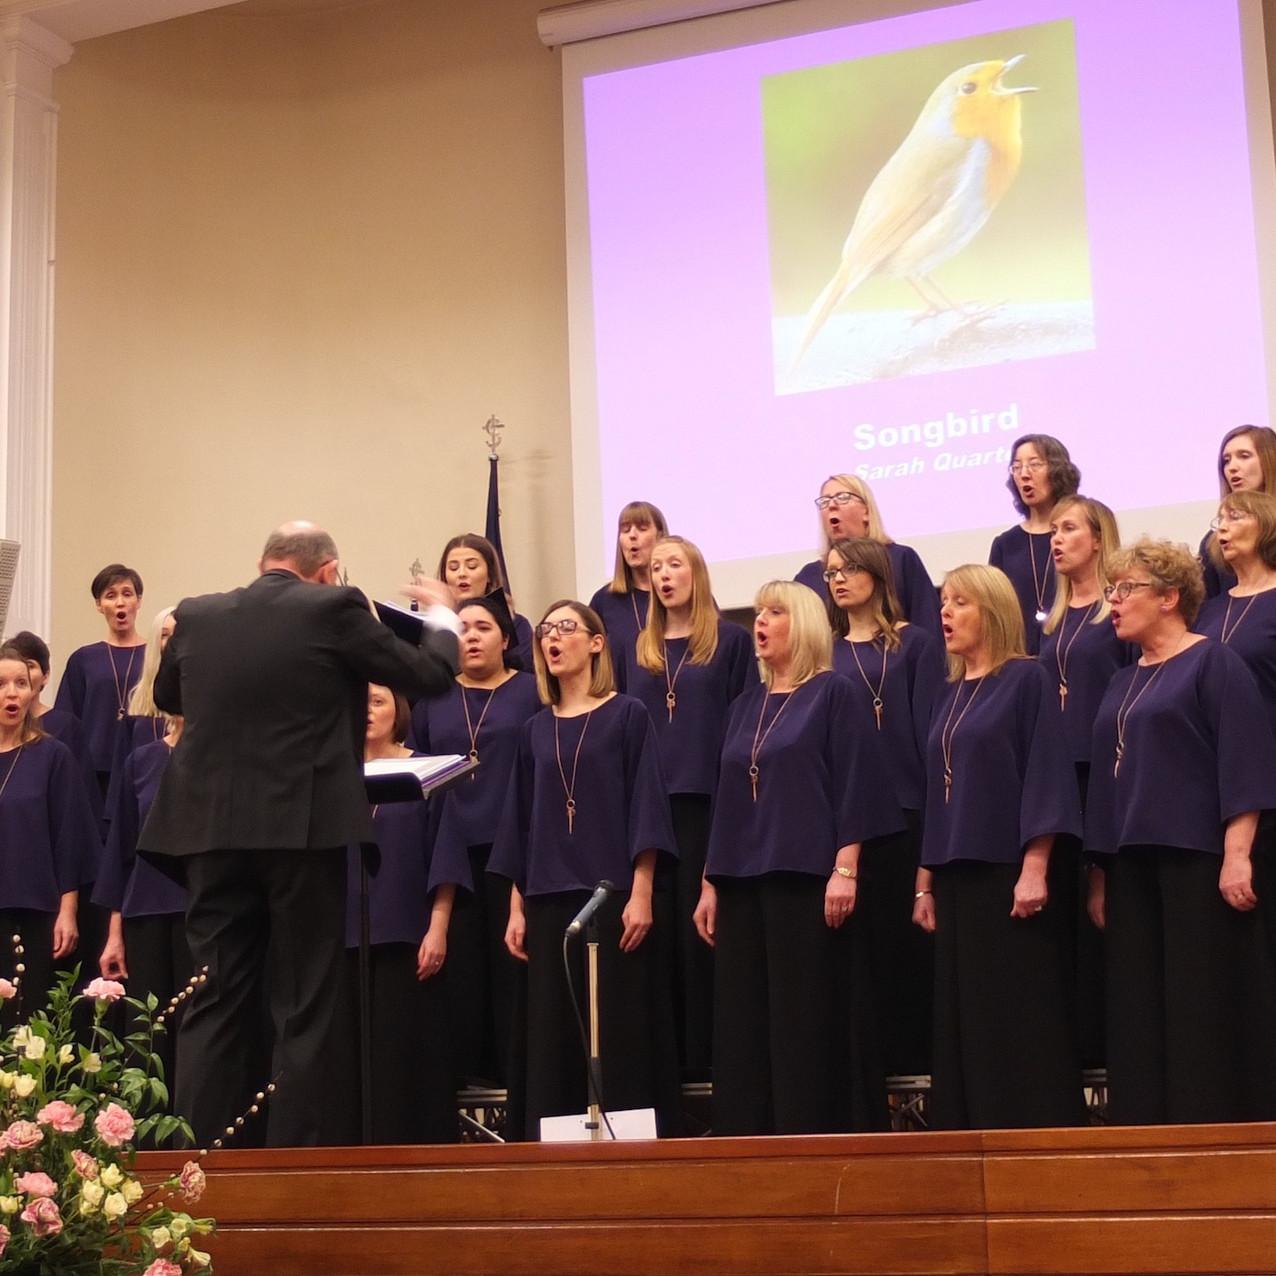 Belcanto choir